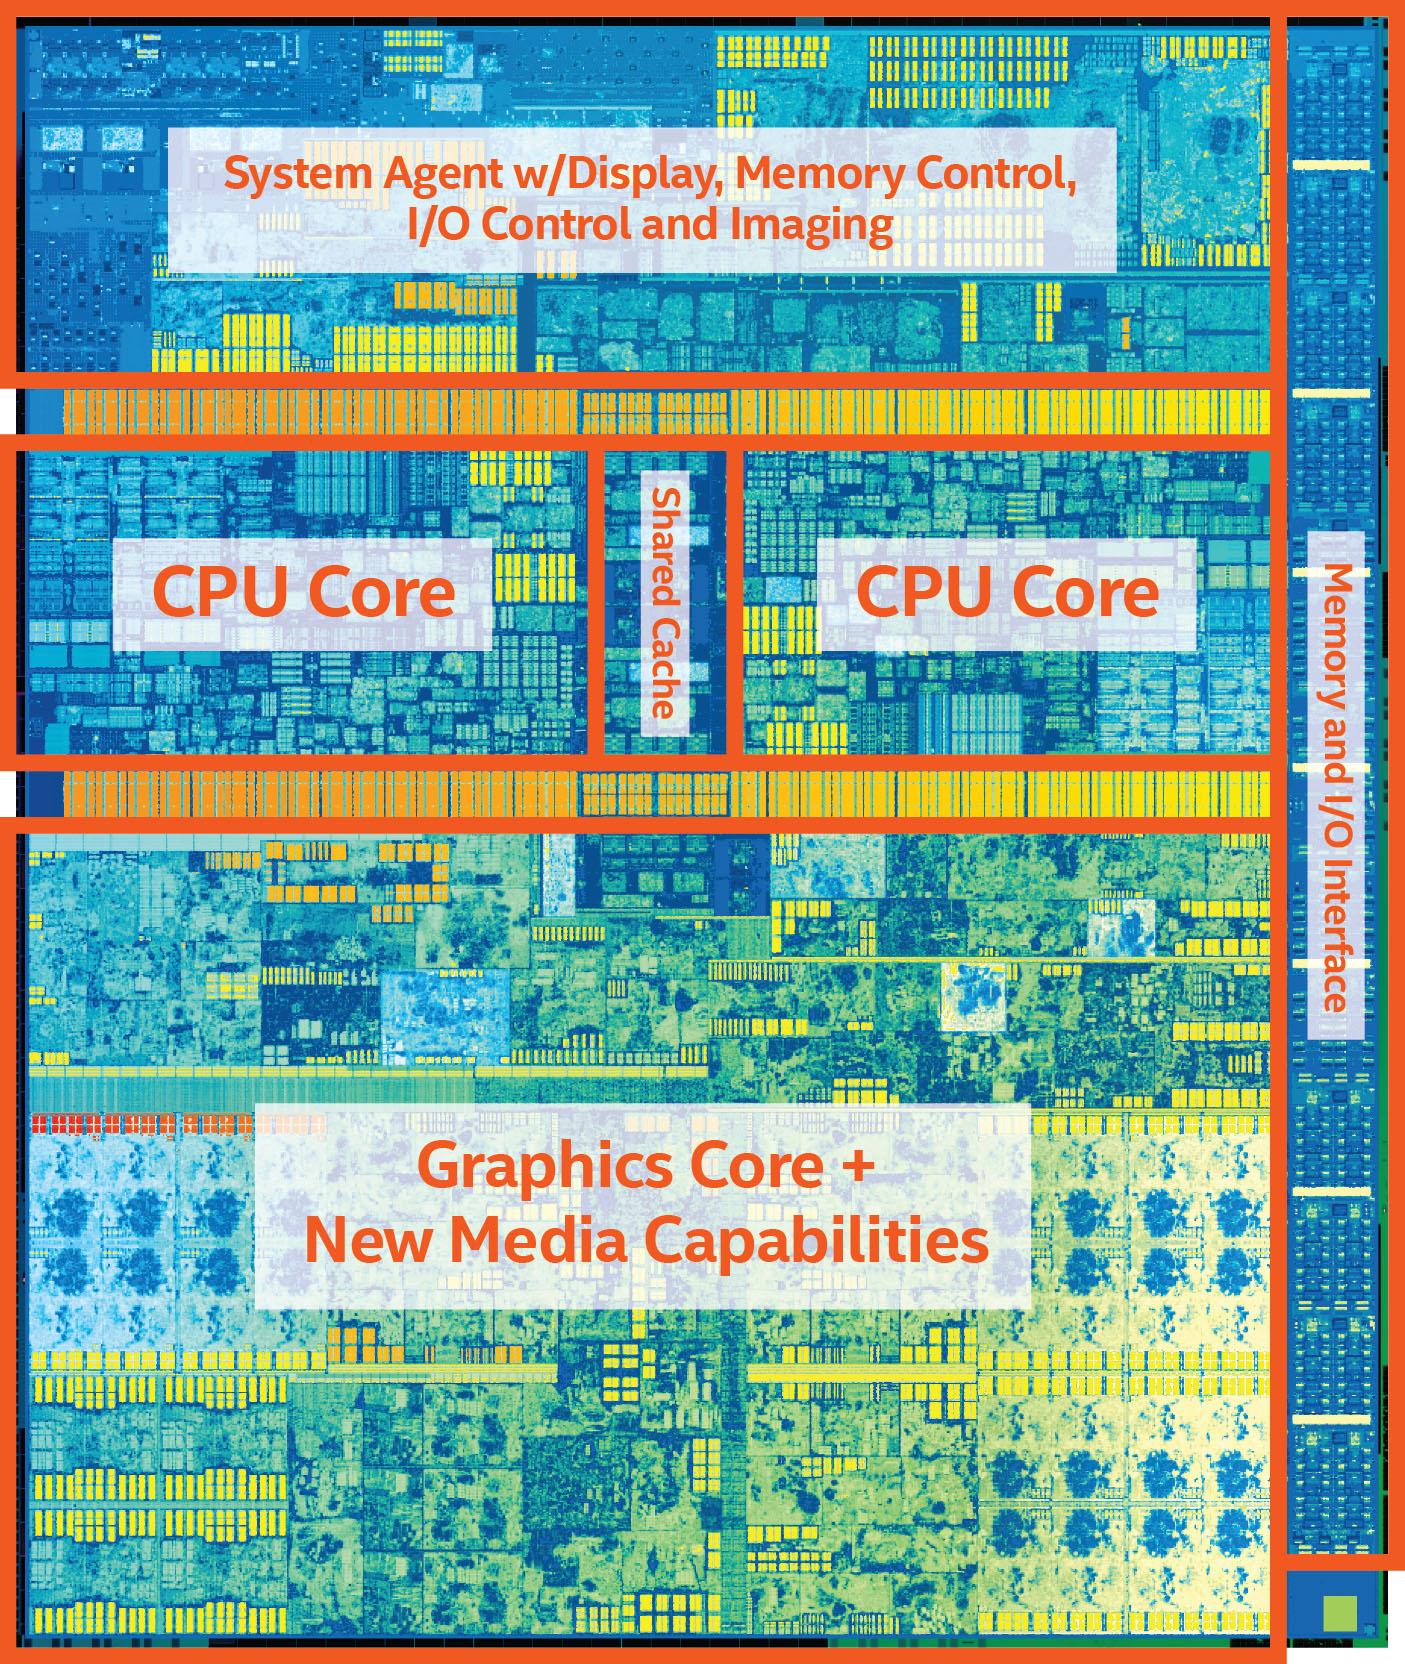 7th Gen Intel Core die with label